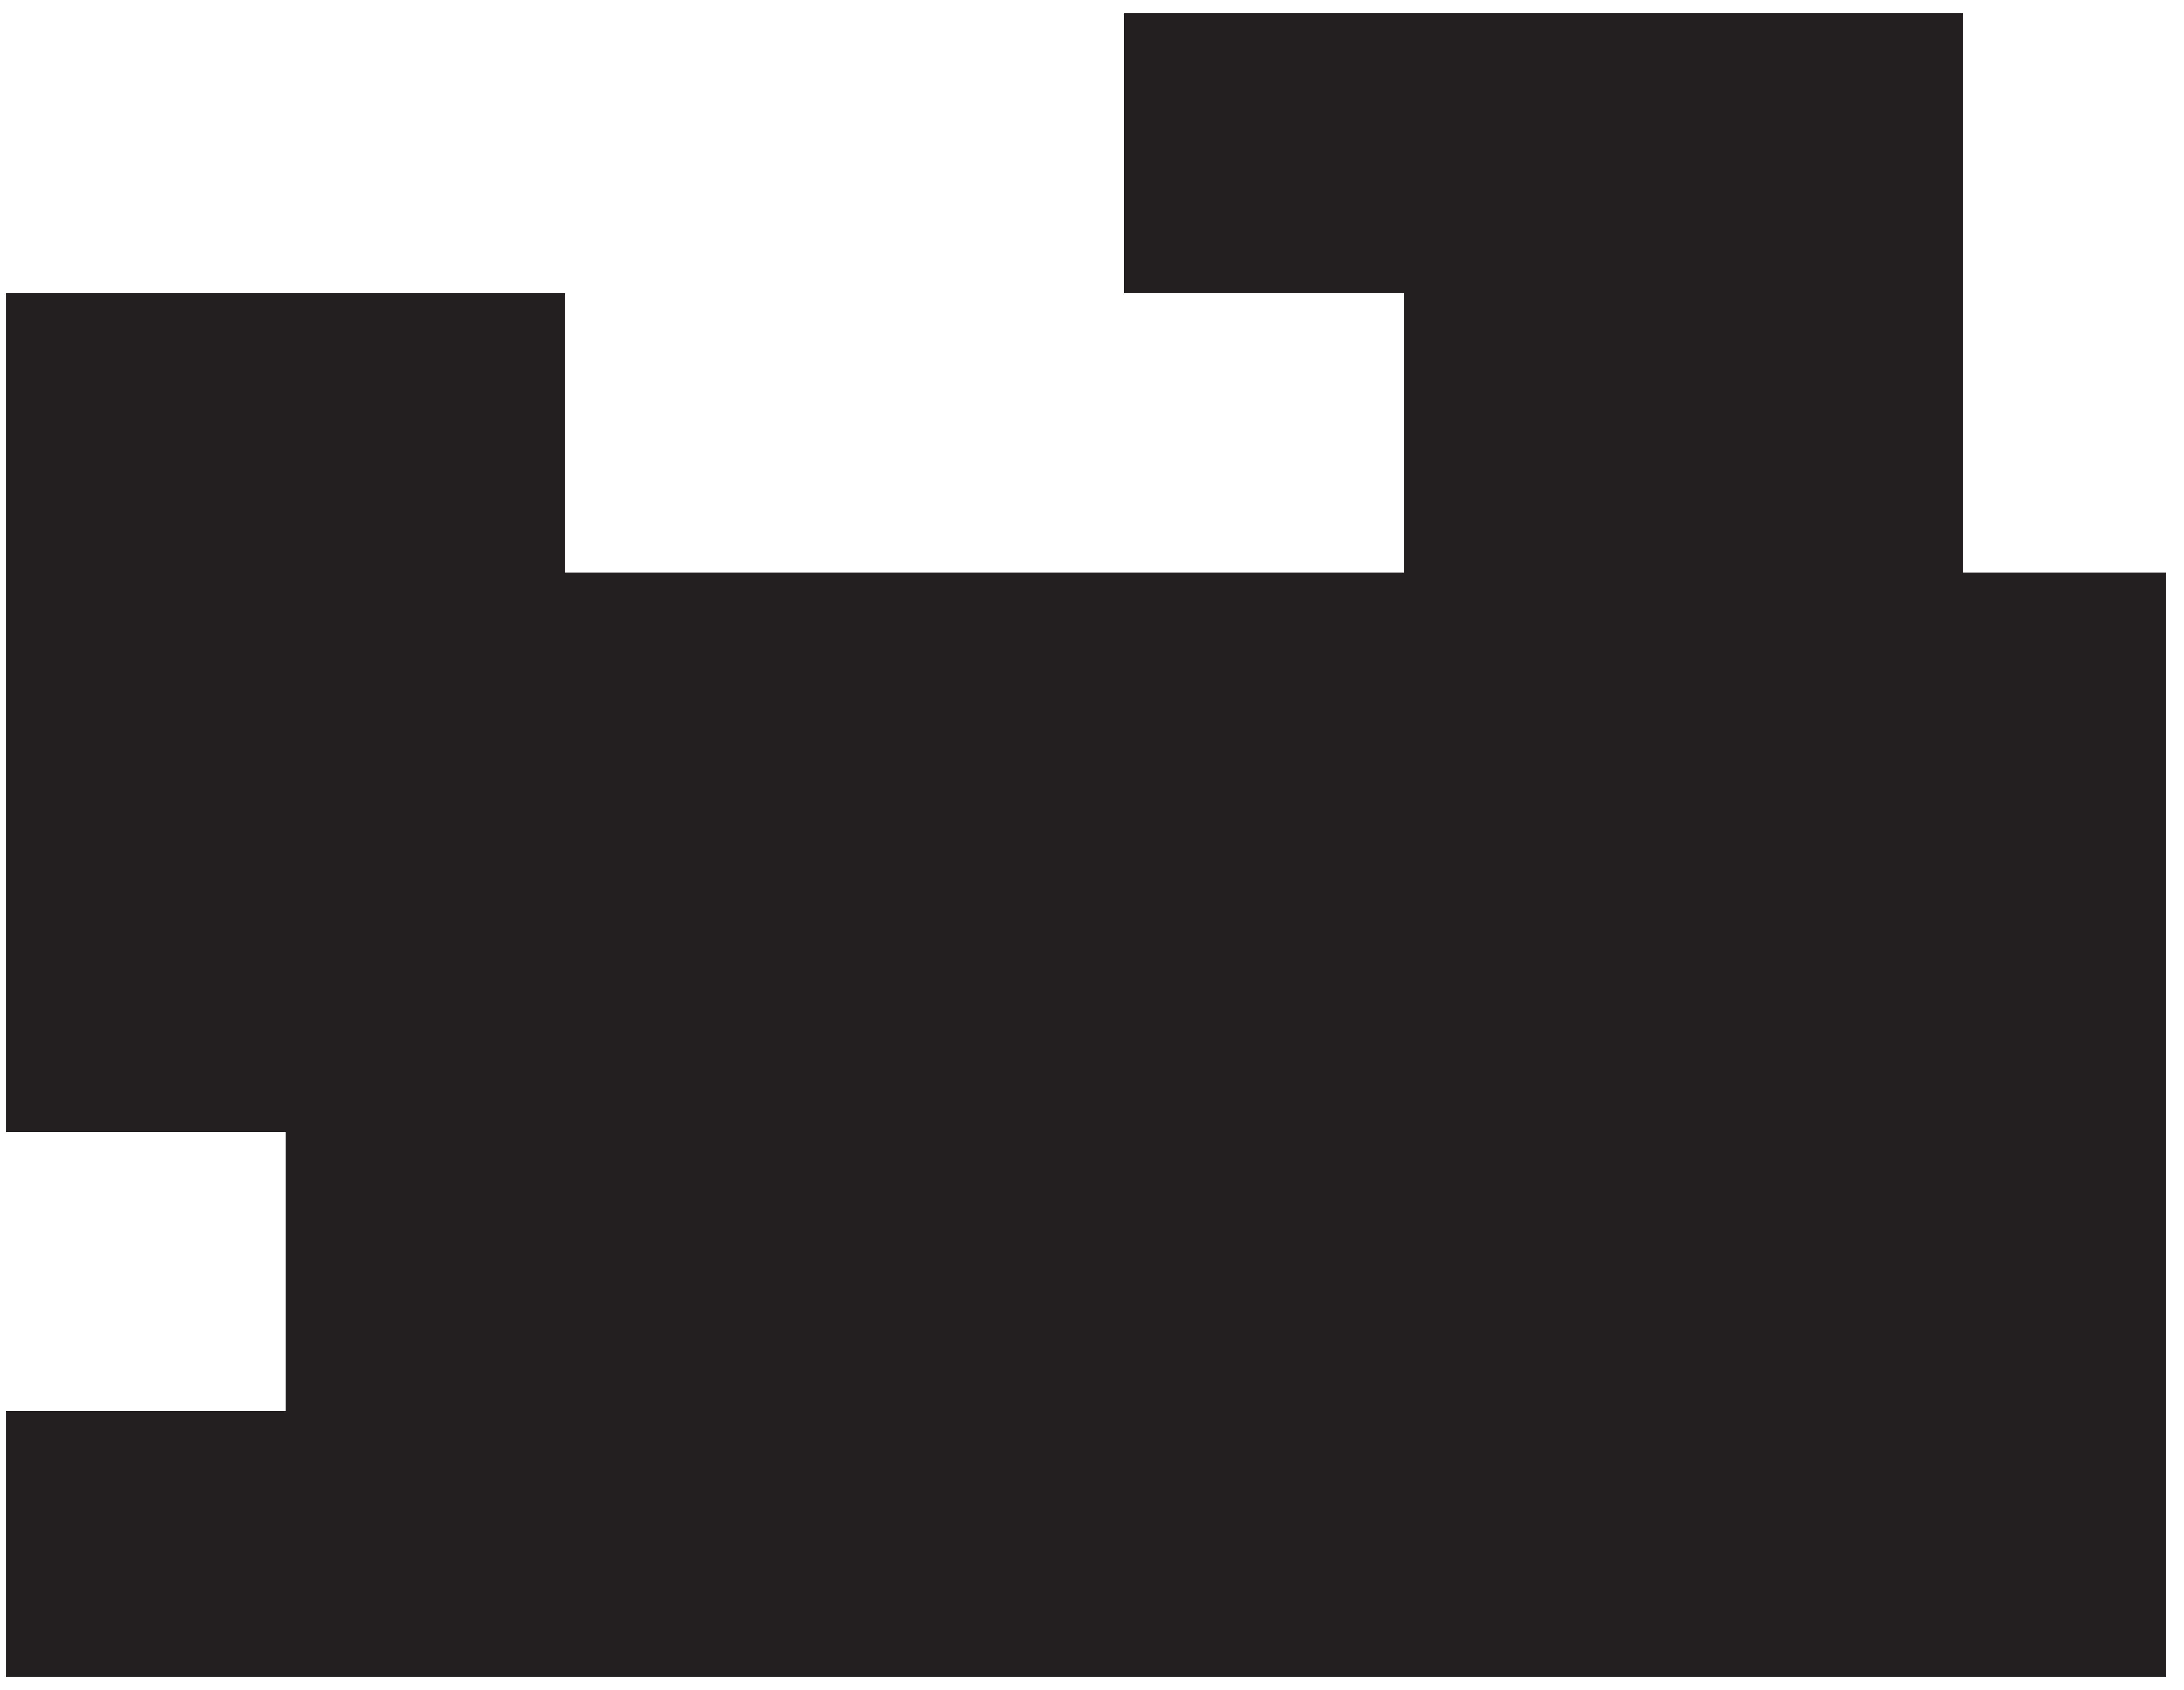 8000x6190 Kitten Silhouette Png Clip Art Imageu200b Gallery Yopriceville